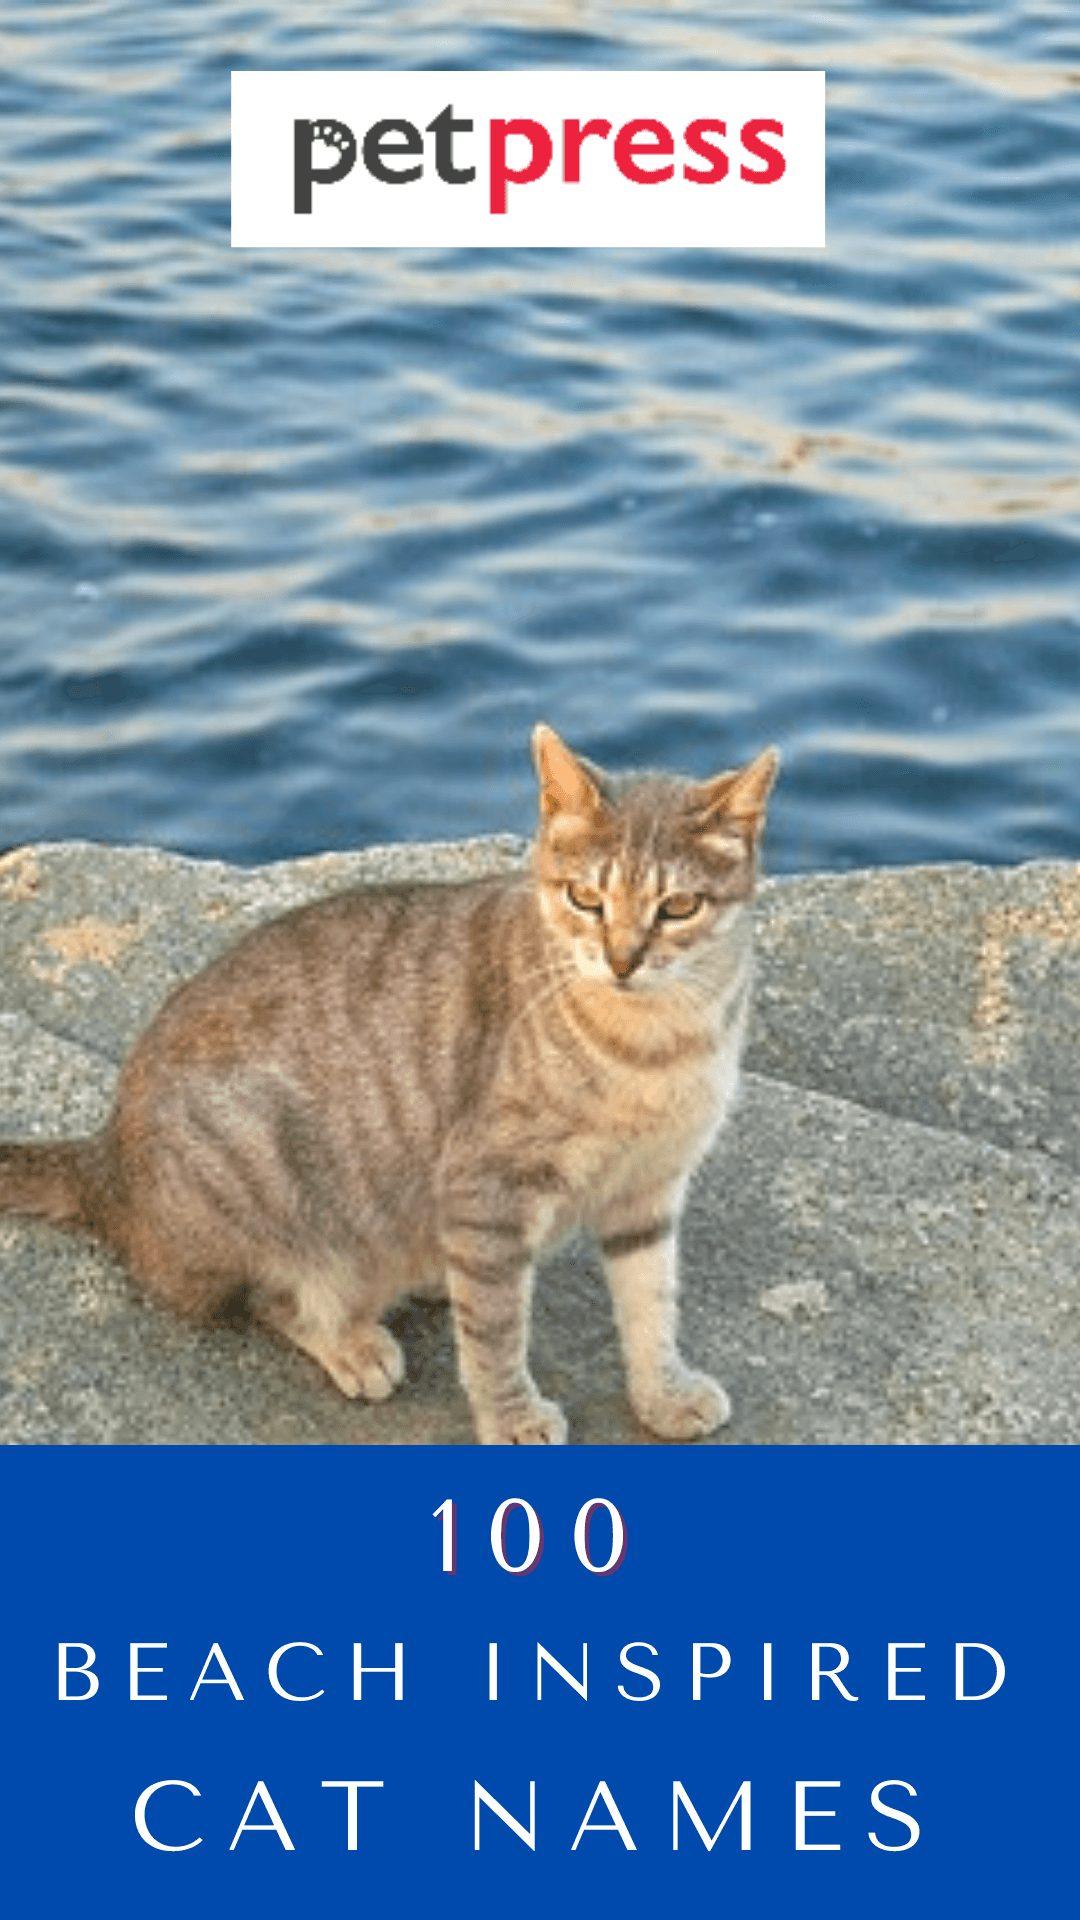 beach-cat-names